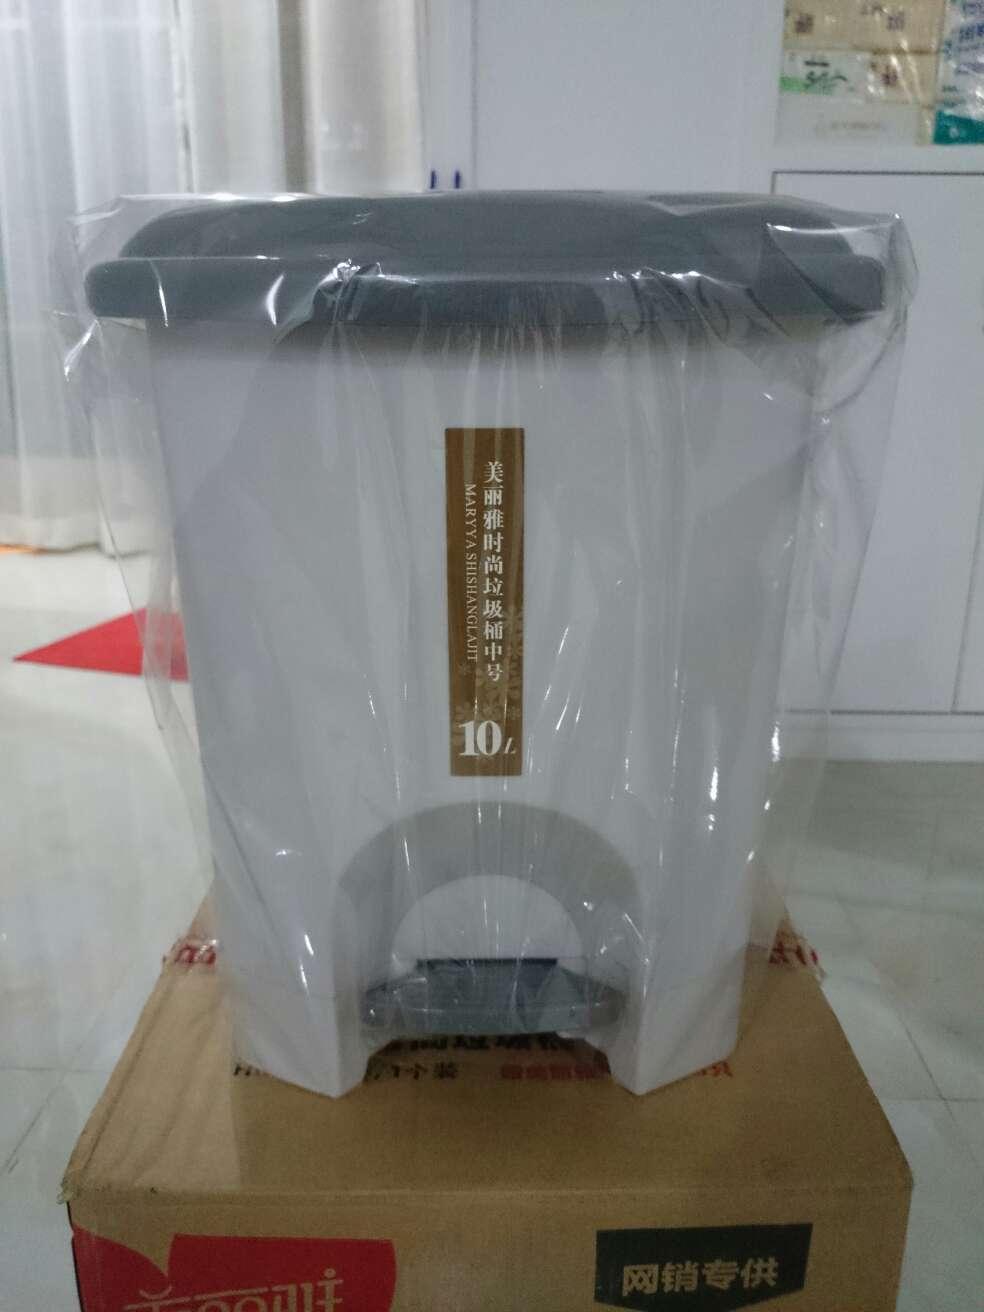 jordan for sale 100 authentic reviews 00153560 discountonlinestore